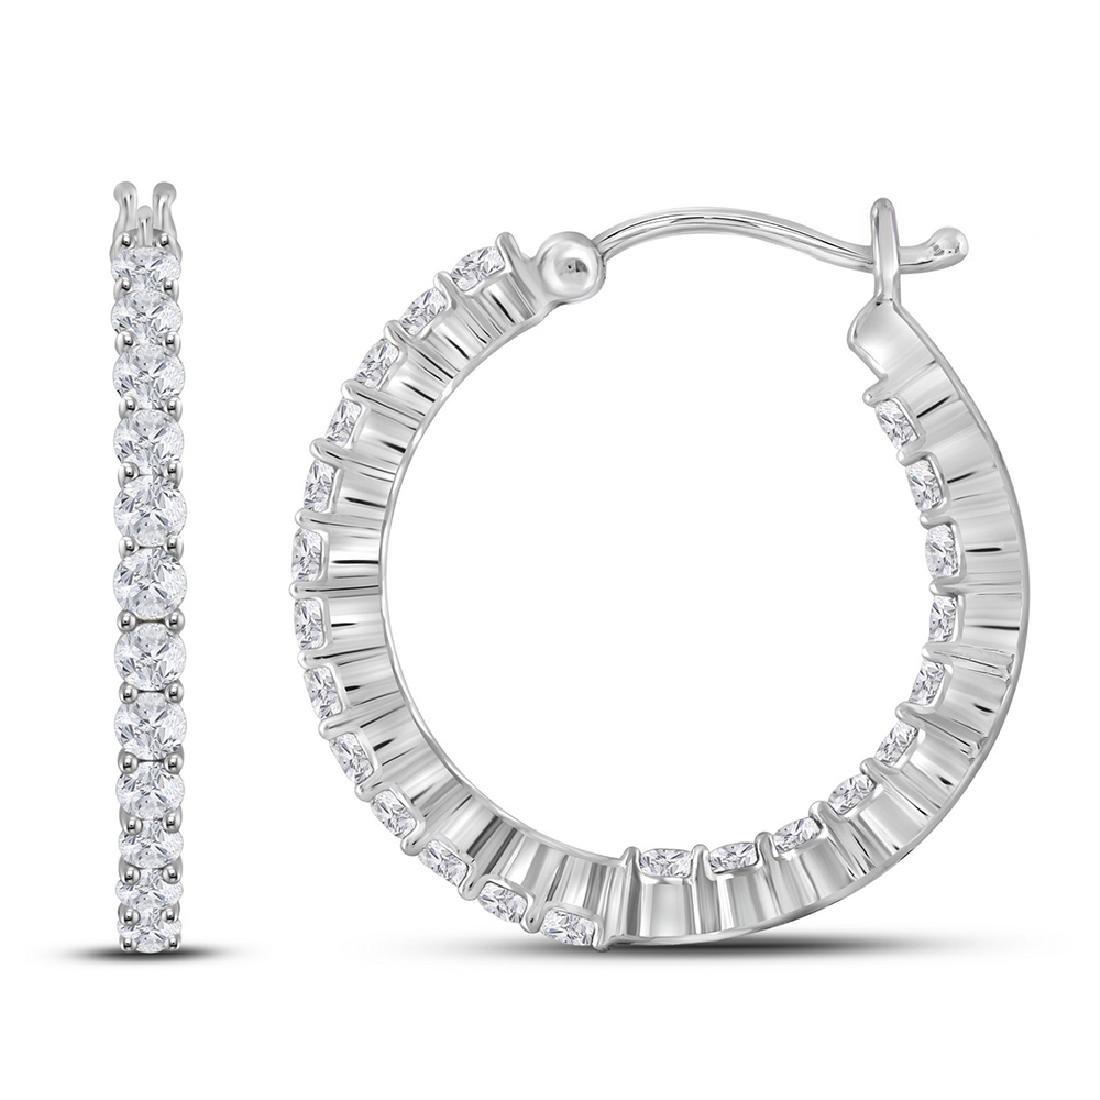 1.96 CTW Diamond Single Row Hoop Earrings 14KT White